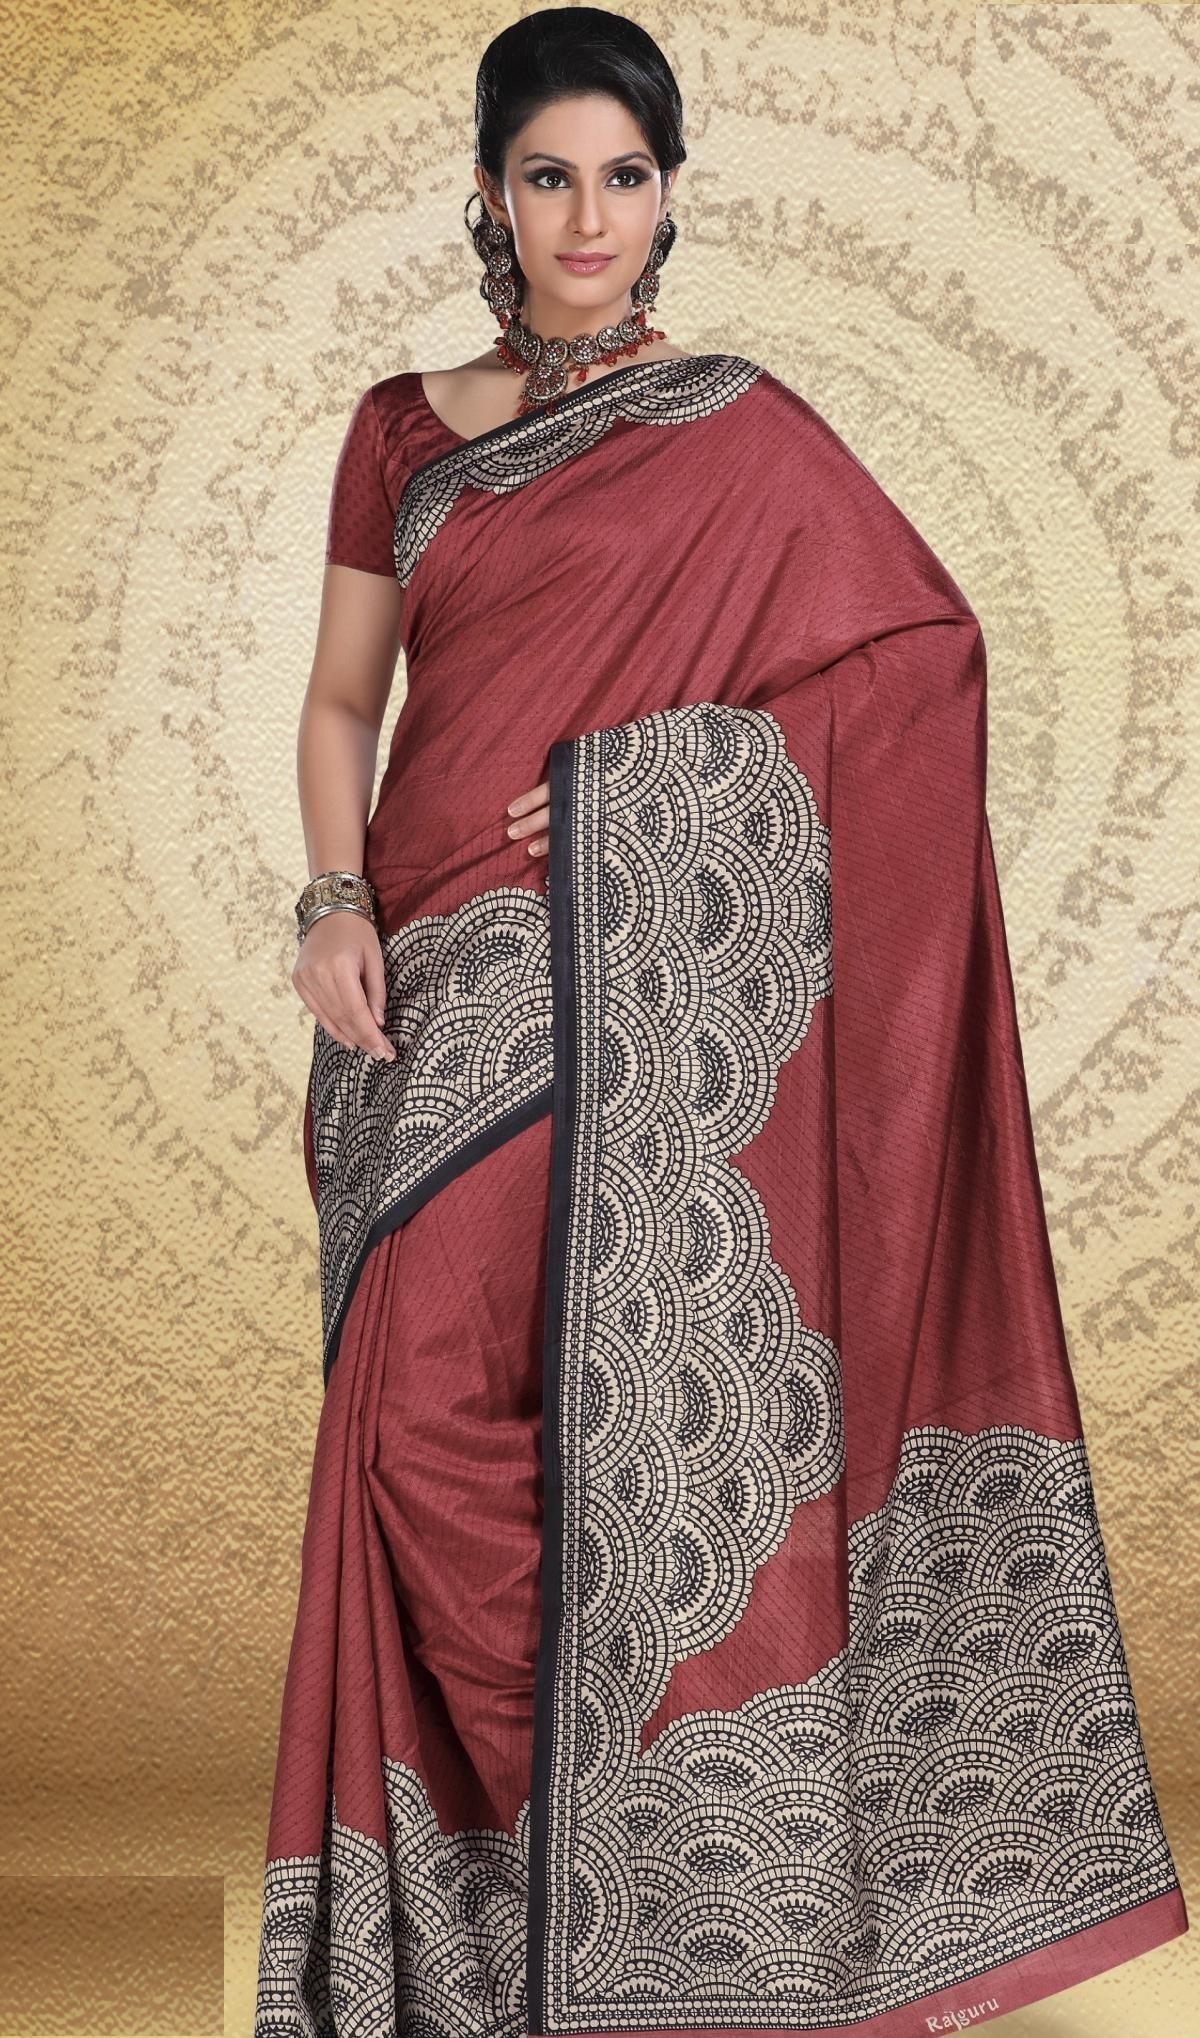 Indian-Designer-Banarasi-Saree-Designs (31)